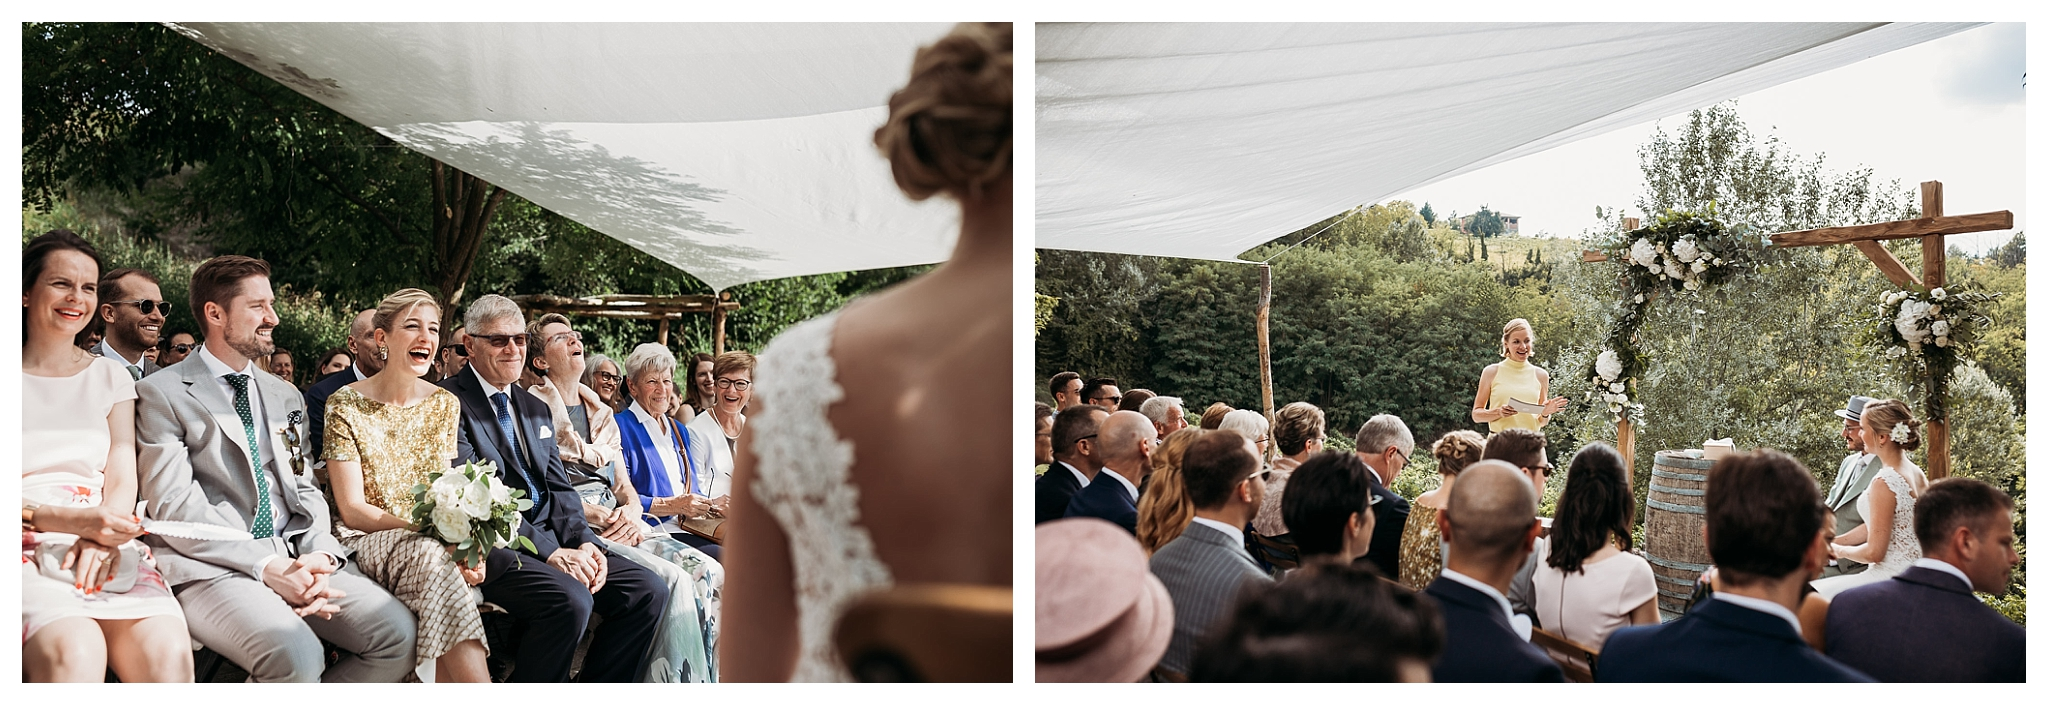 Open air wedding ceremony in the countryside of Italy at La Villa Hotel, Mombaruzzo